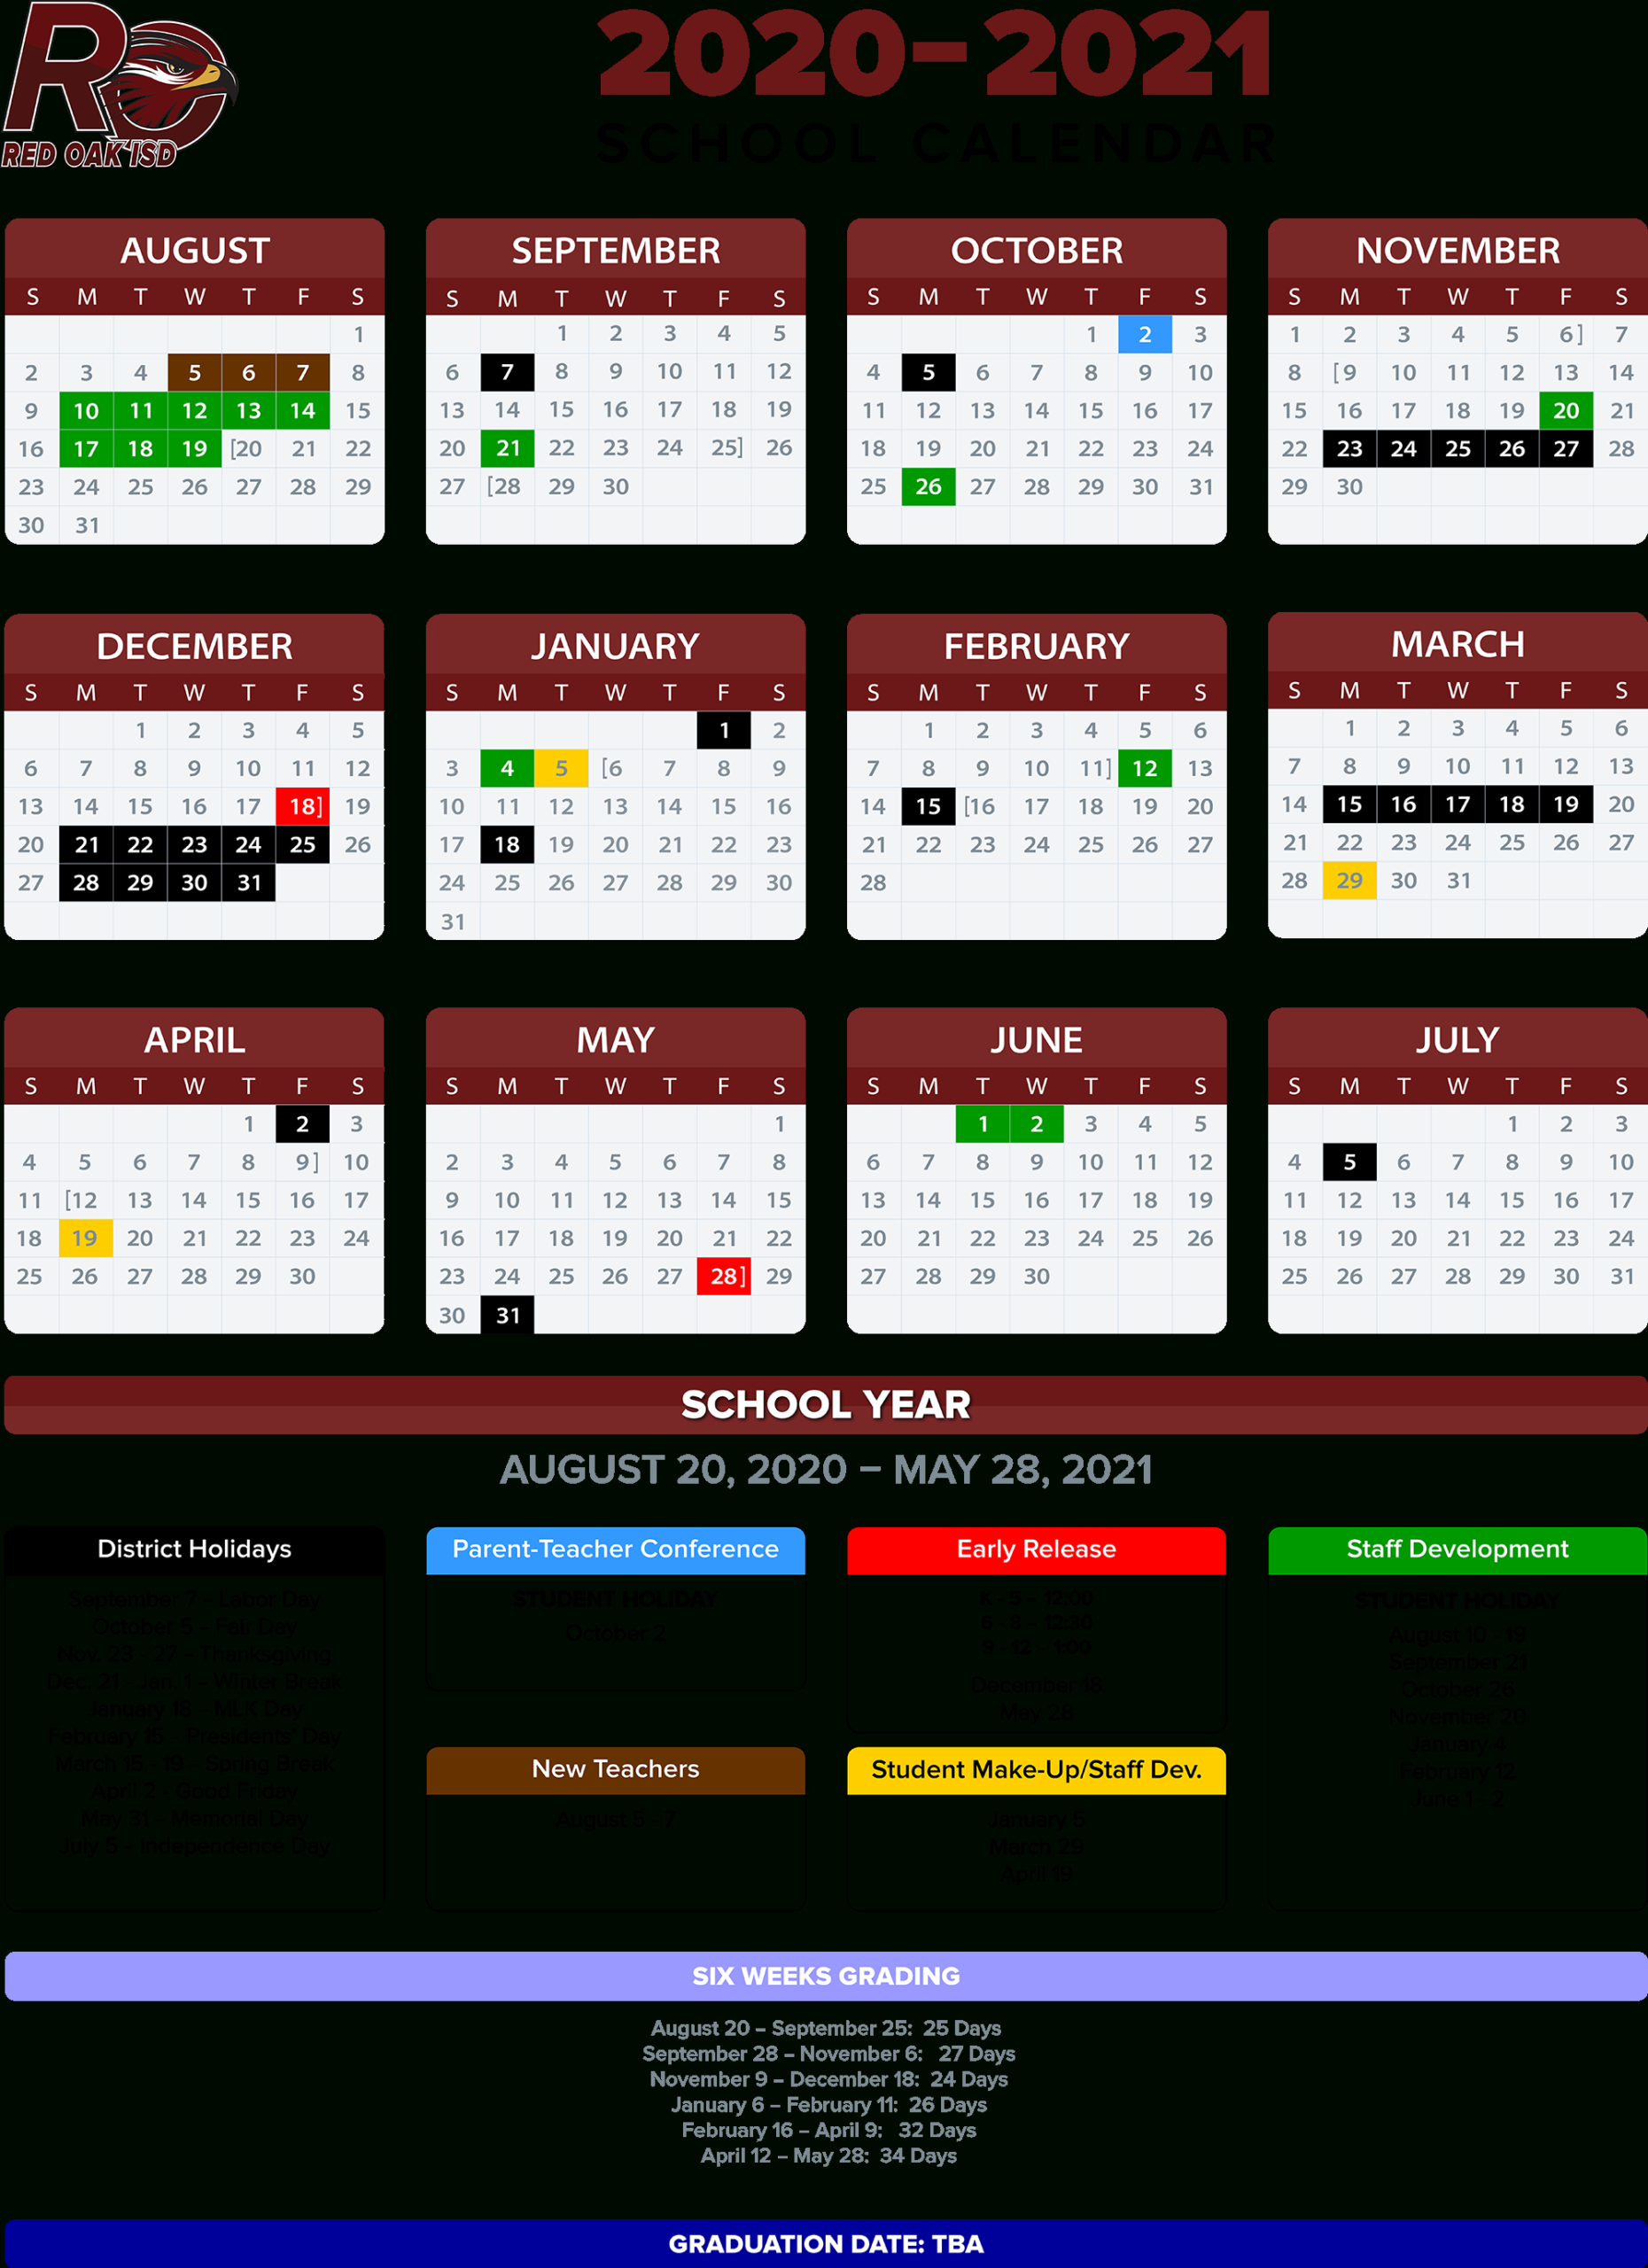 2020-2021 School Calendar / Annual Calendar - 2020-2021